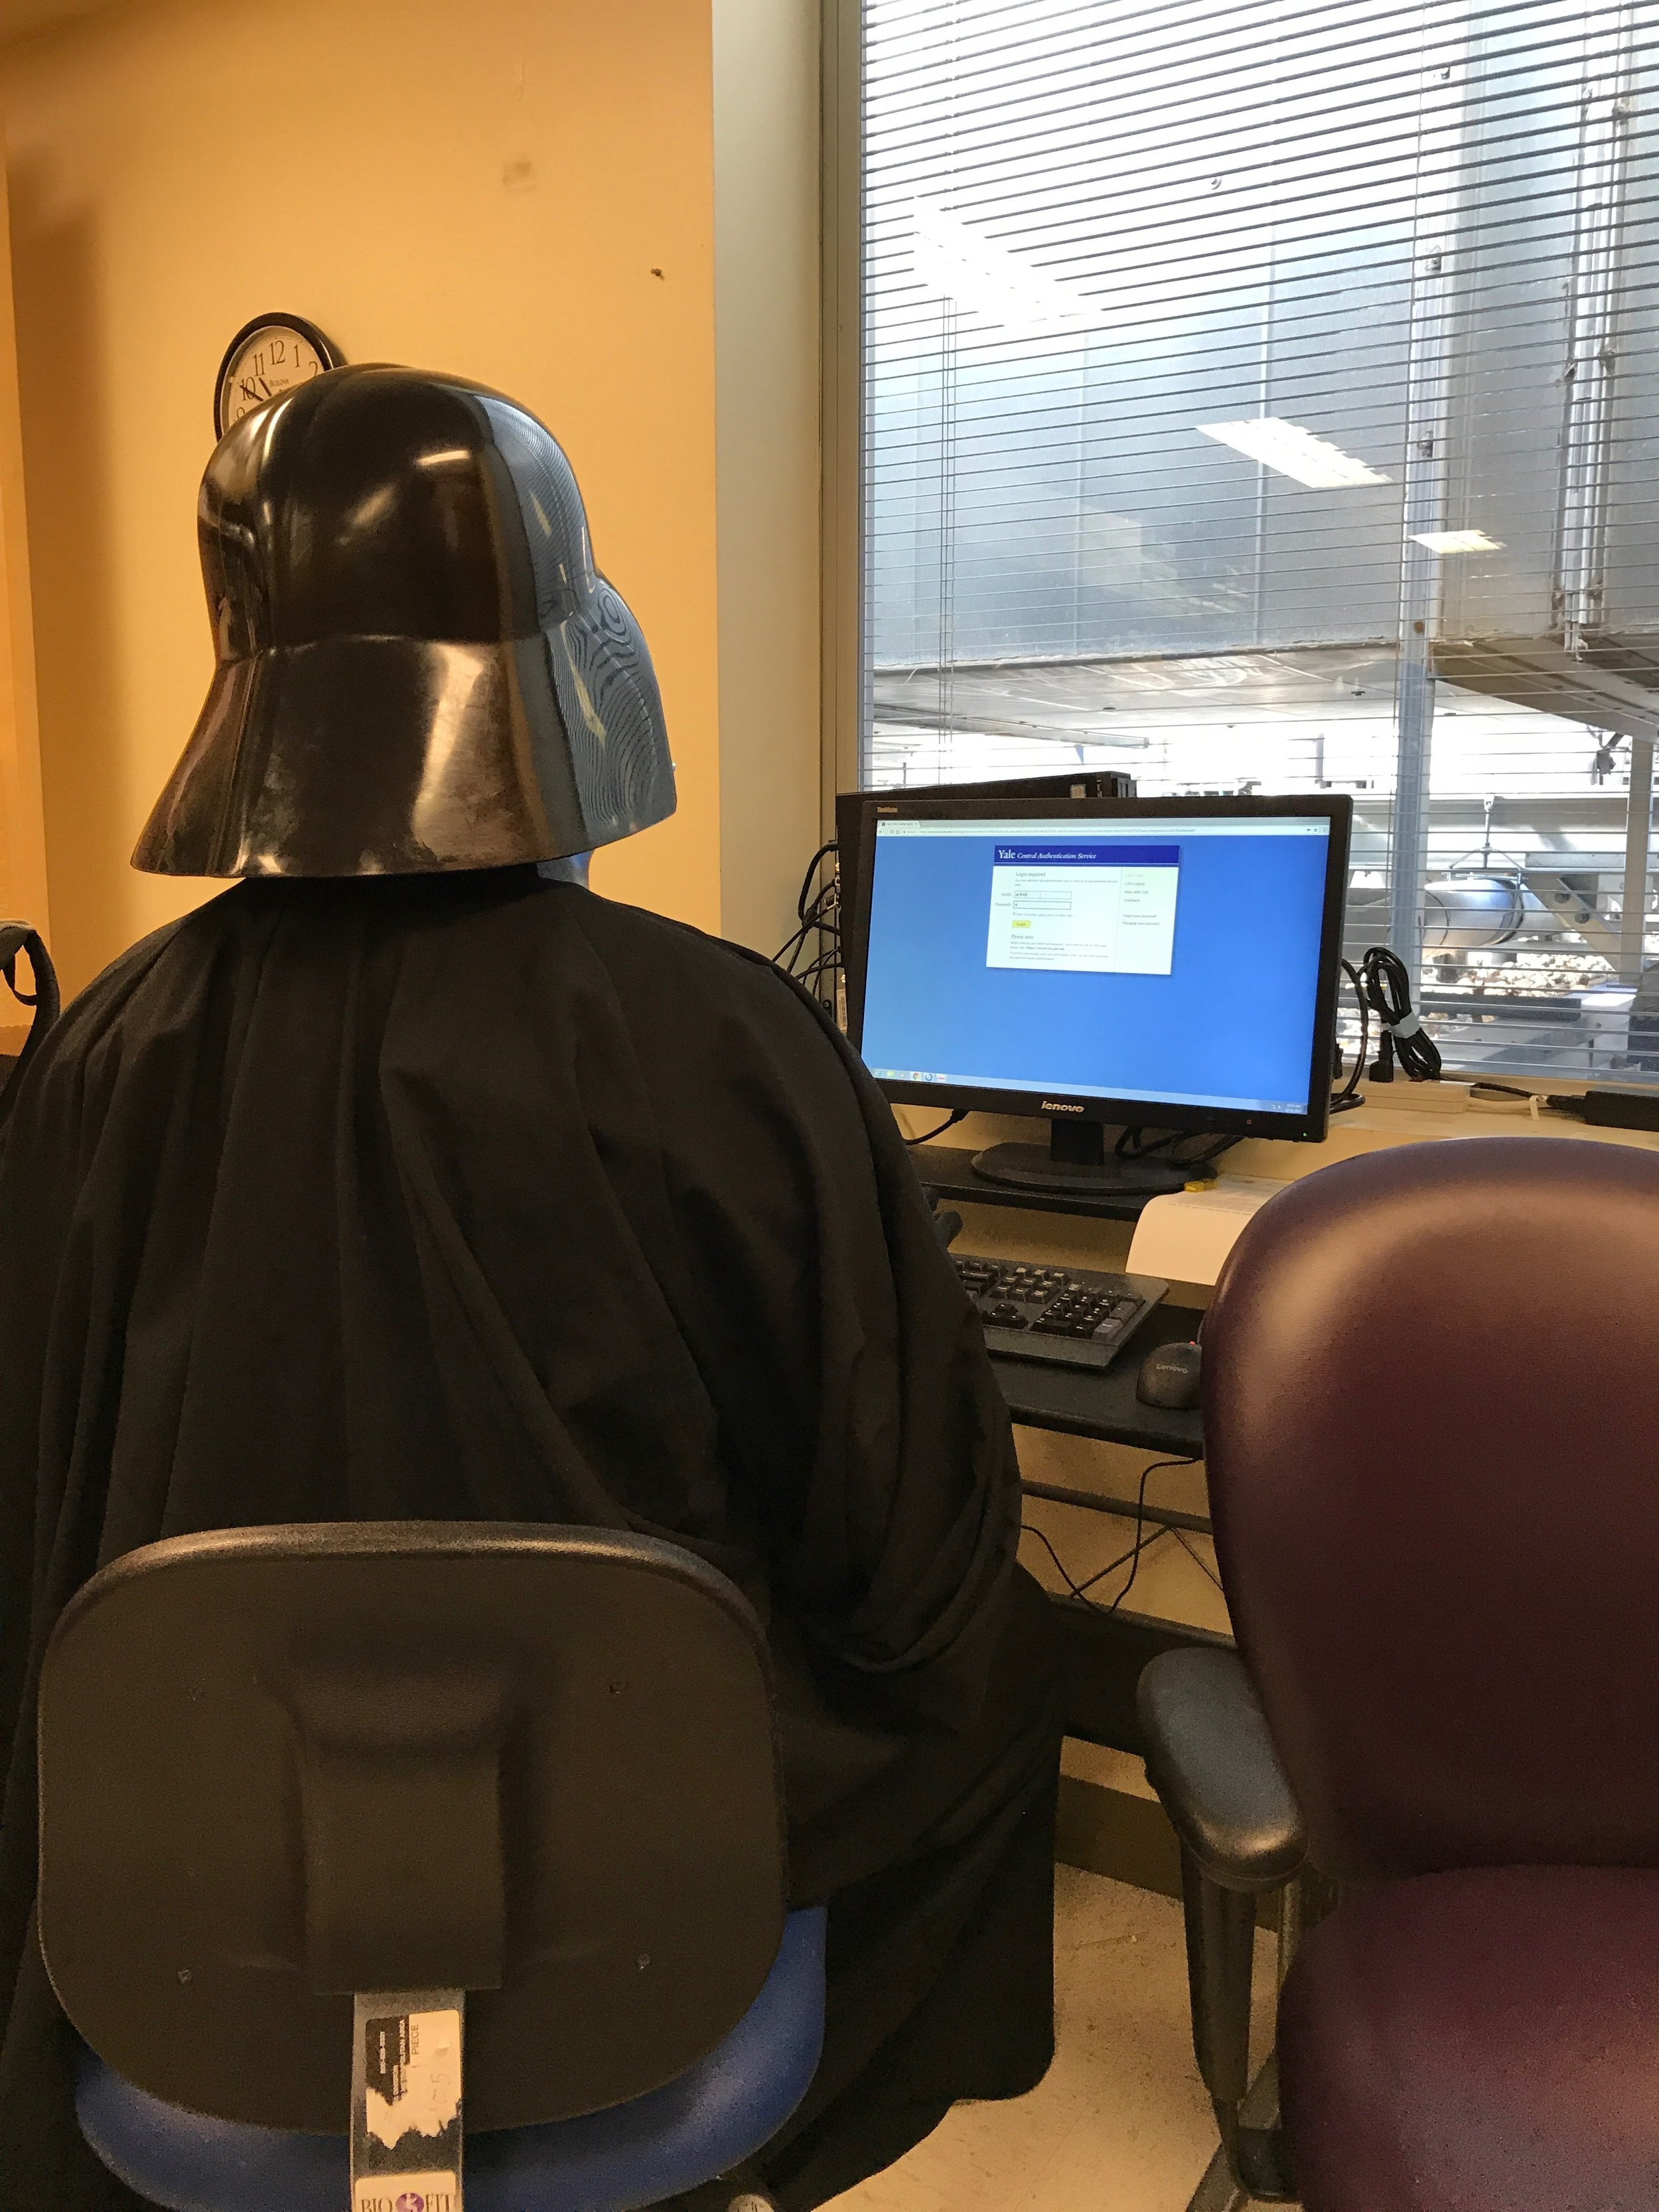 Dark Lord hard at work?